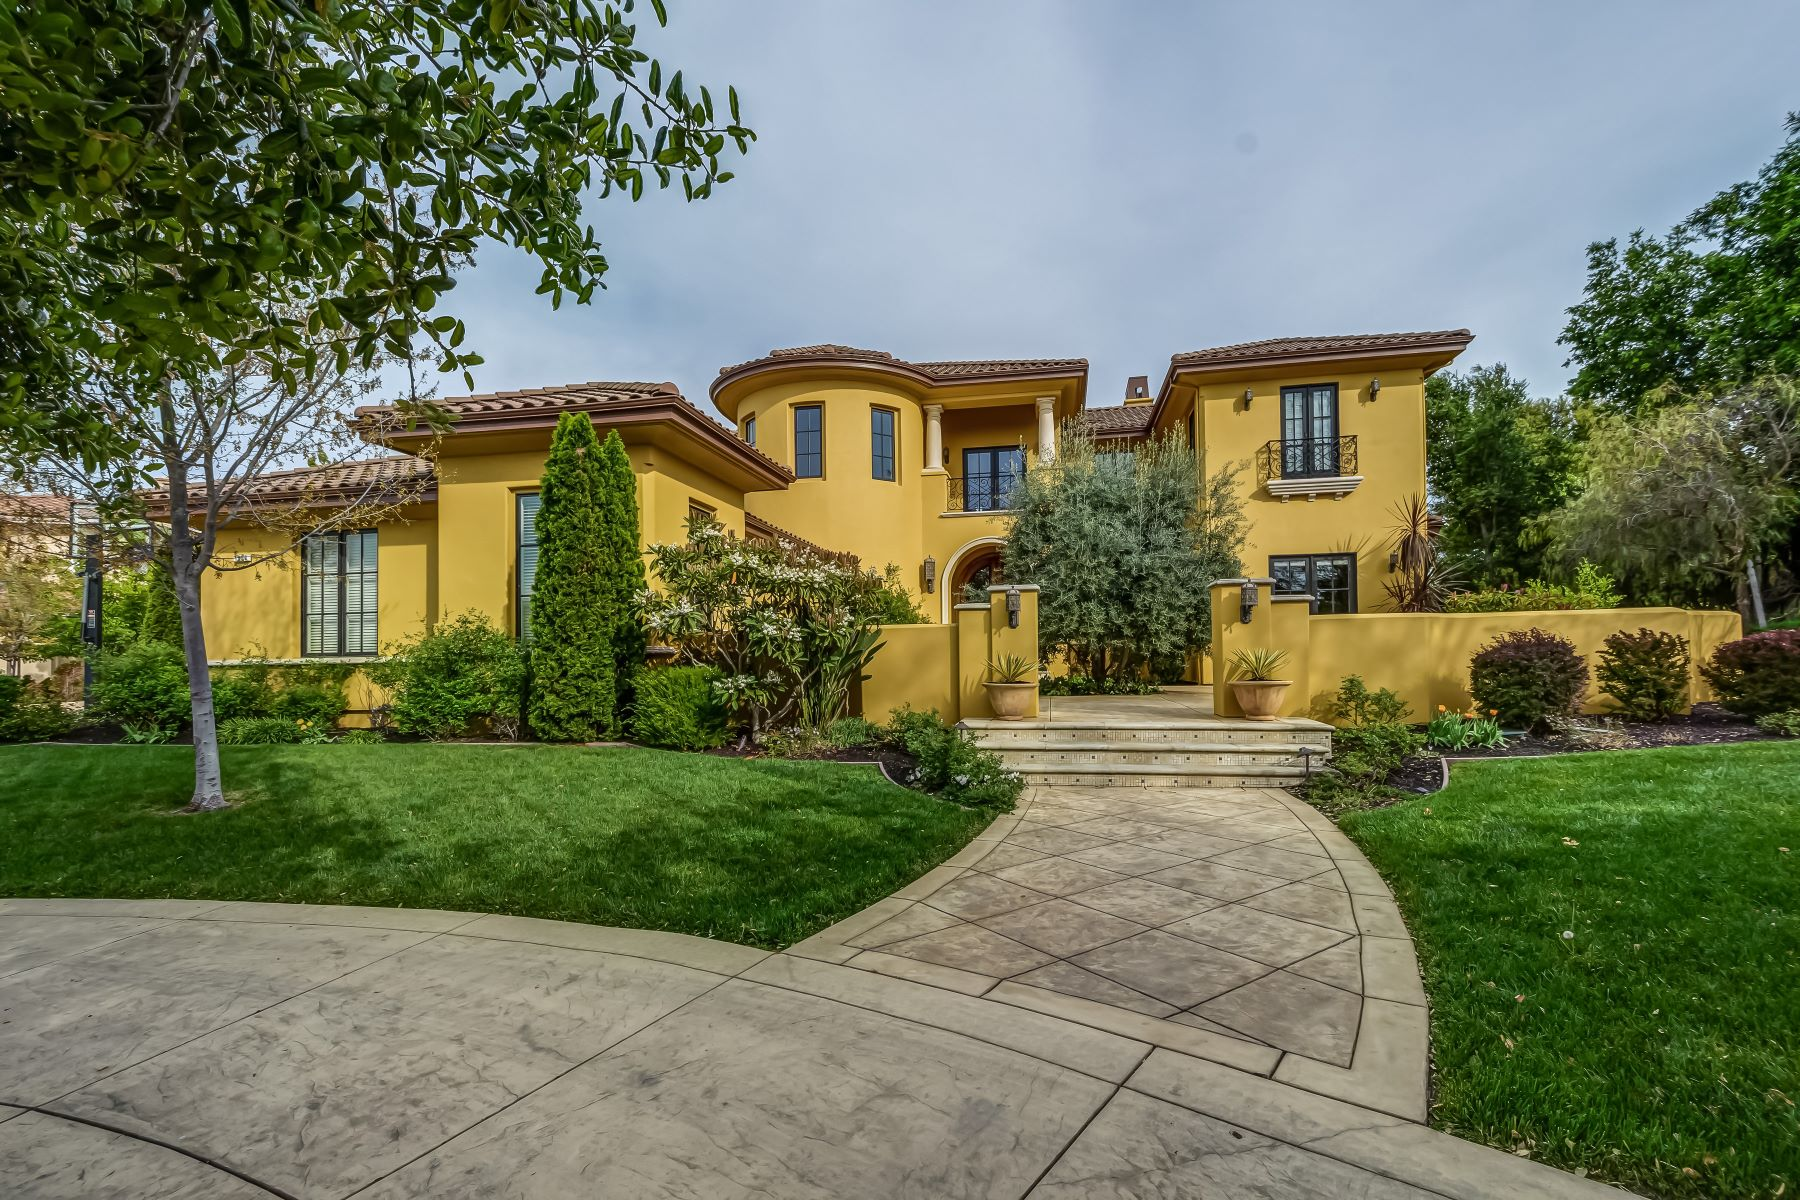 واحد منزل الأسرة للـ Sale في 1833 Via Di Salerno Pleasanton, California 94566 United States